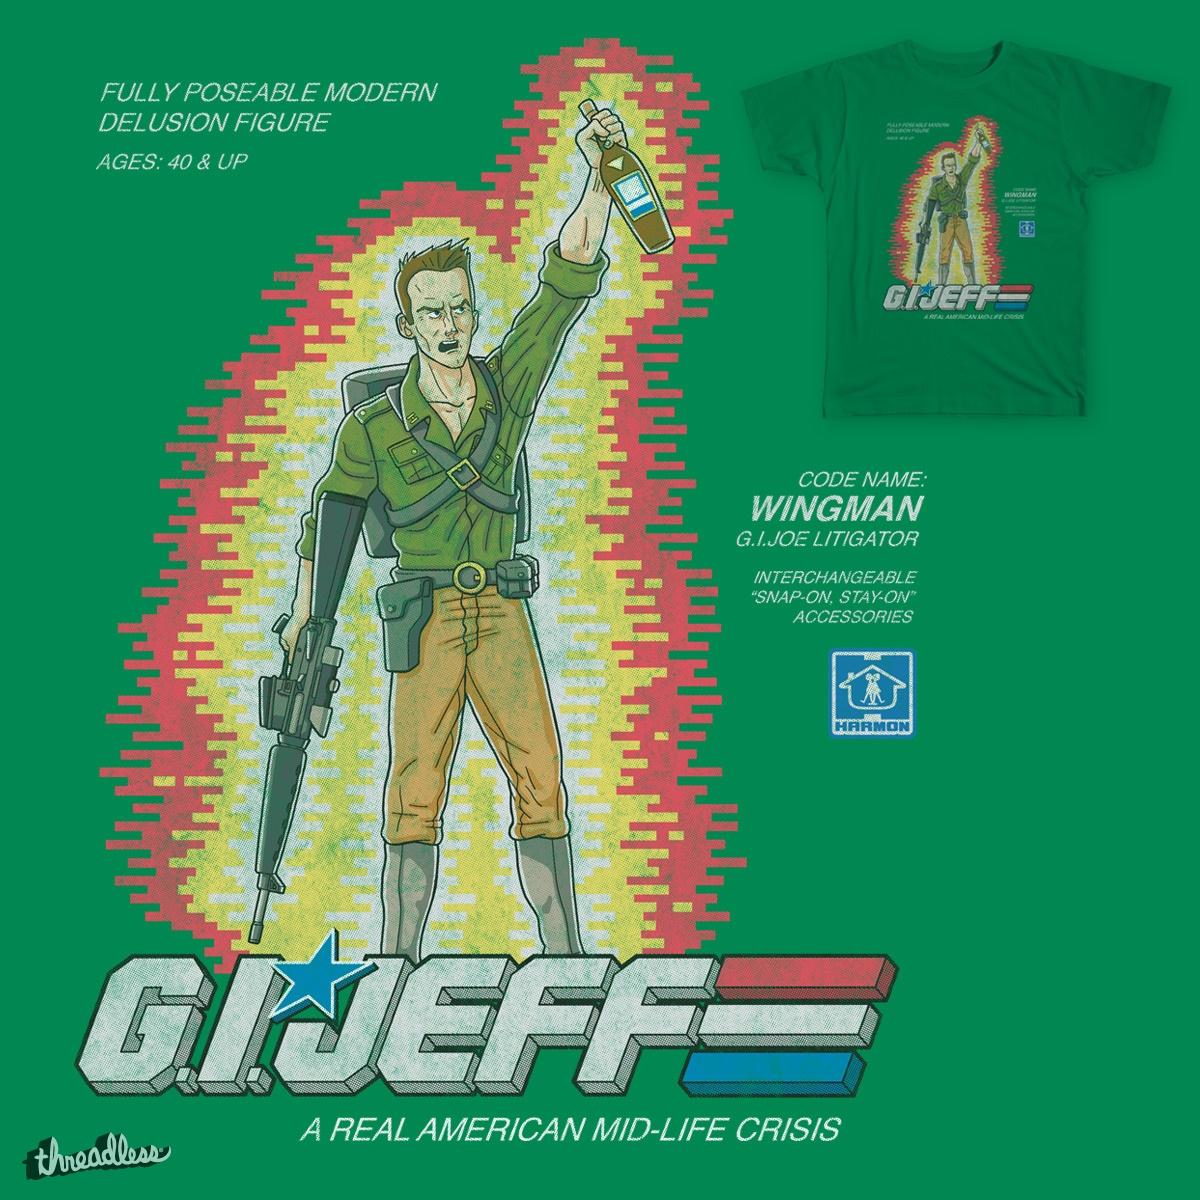 G.I. JEFF by blackhand_ on Threadless